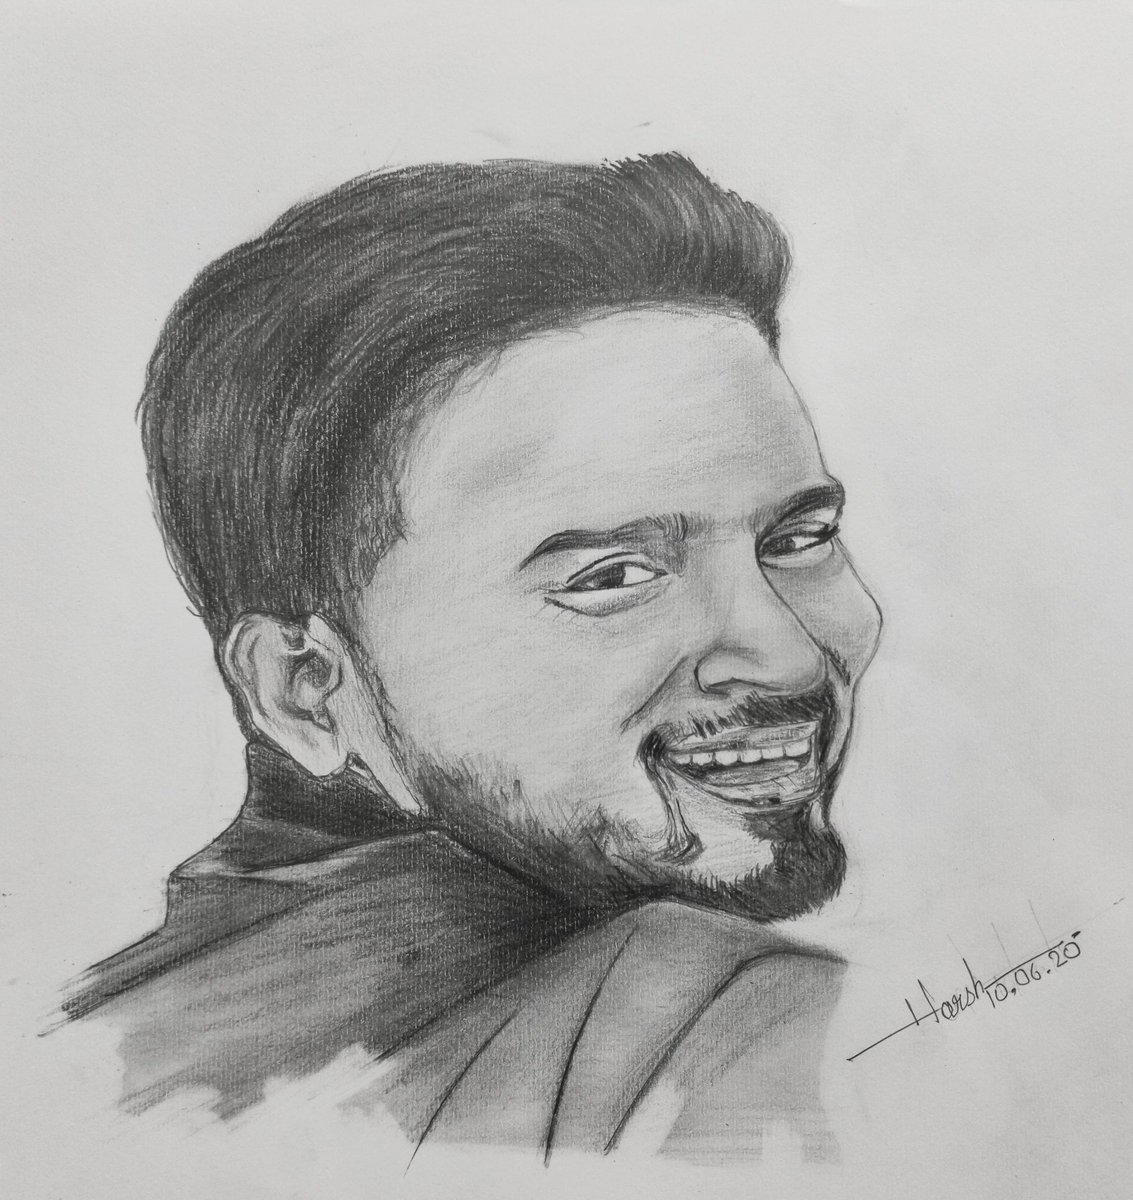 Realistic portrait of @iAmitBhadana  hope you love it.  Mention him guys. #YouTuber #amitbhadana #desi #portrait #sketch #realistic #graphiteonpaper #sketchart  @usetty @ArtVansar @AnitaKasabe @dnhartists @IndiaArtHistory @SrBachchan @AmitbhadanaArmy @ItsAmitbhadanapic.twitter.com/cYMZWavT9E